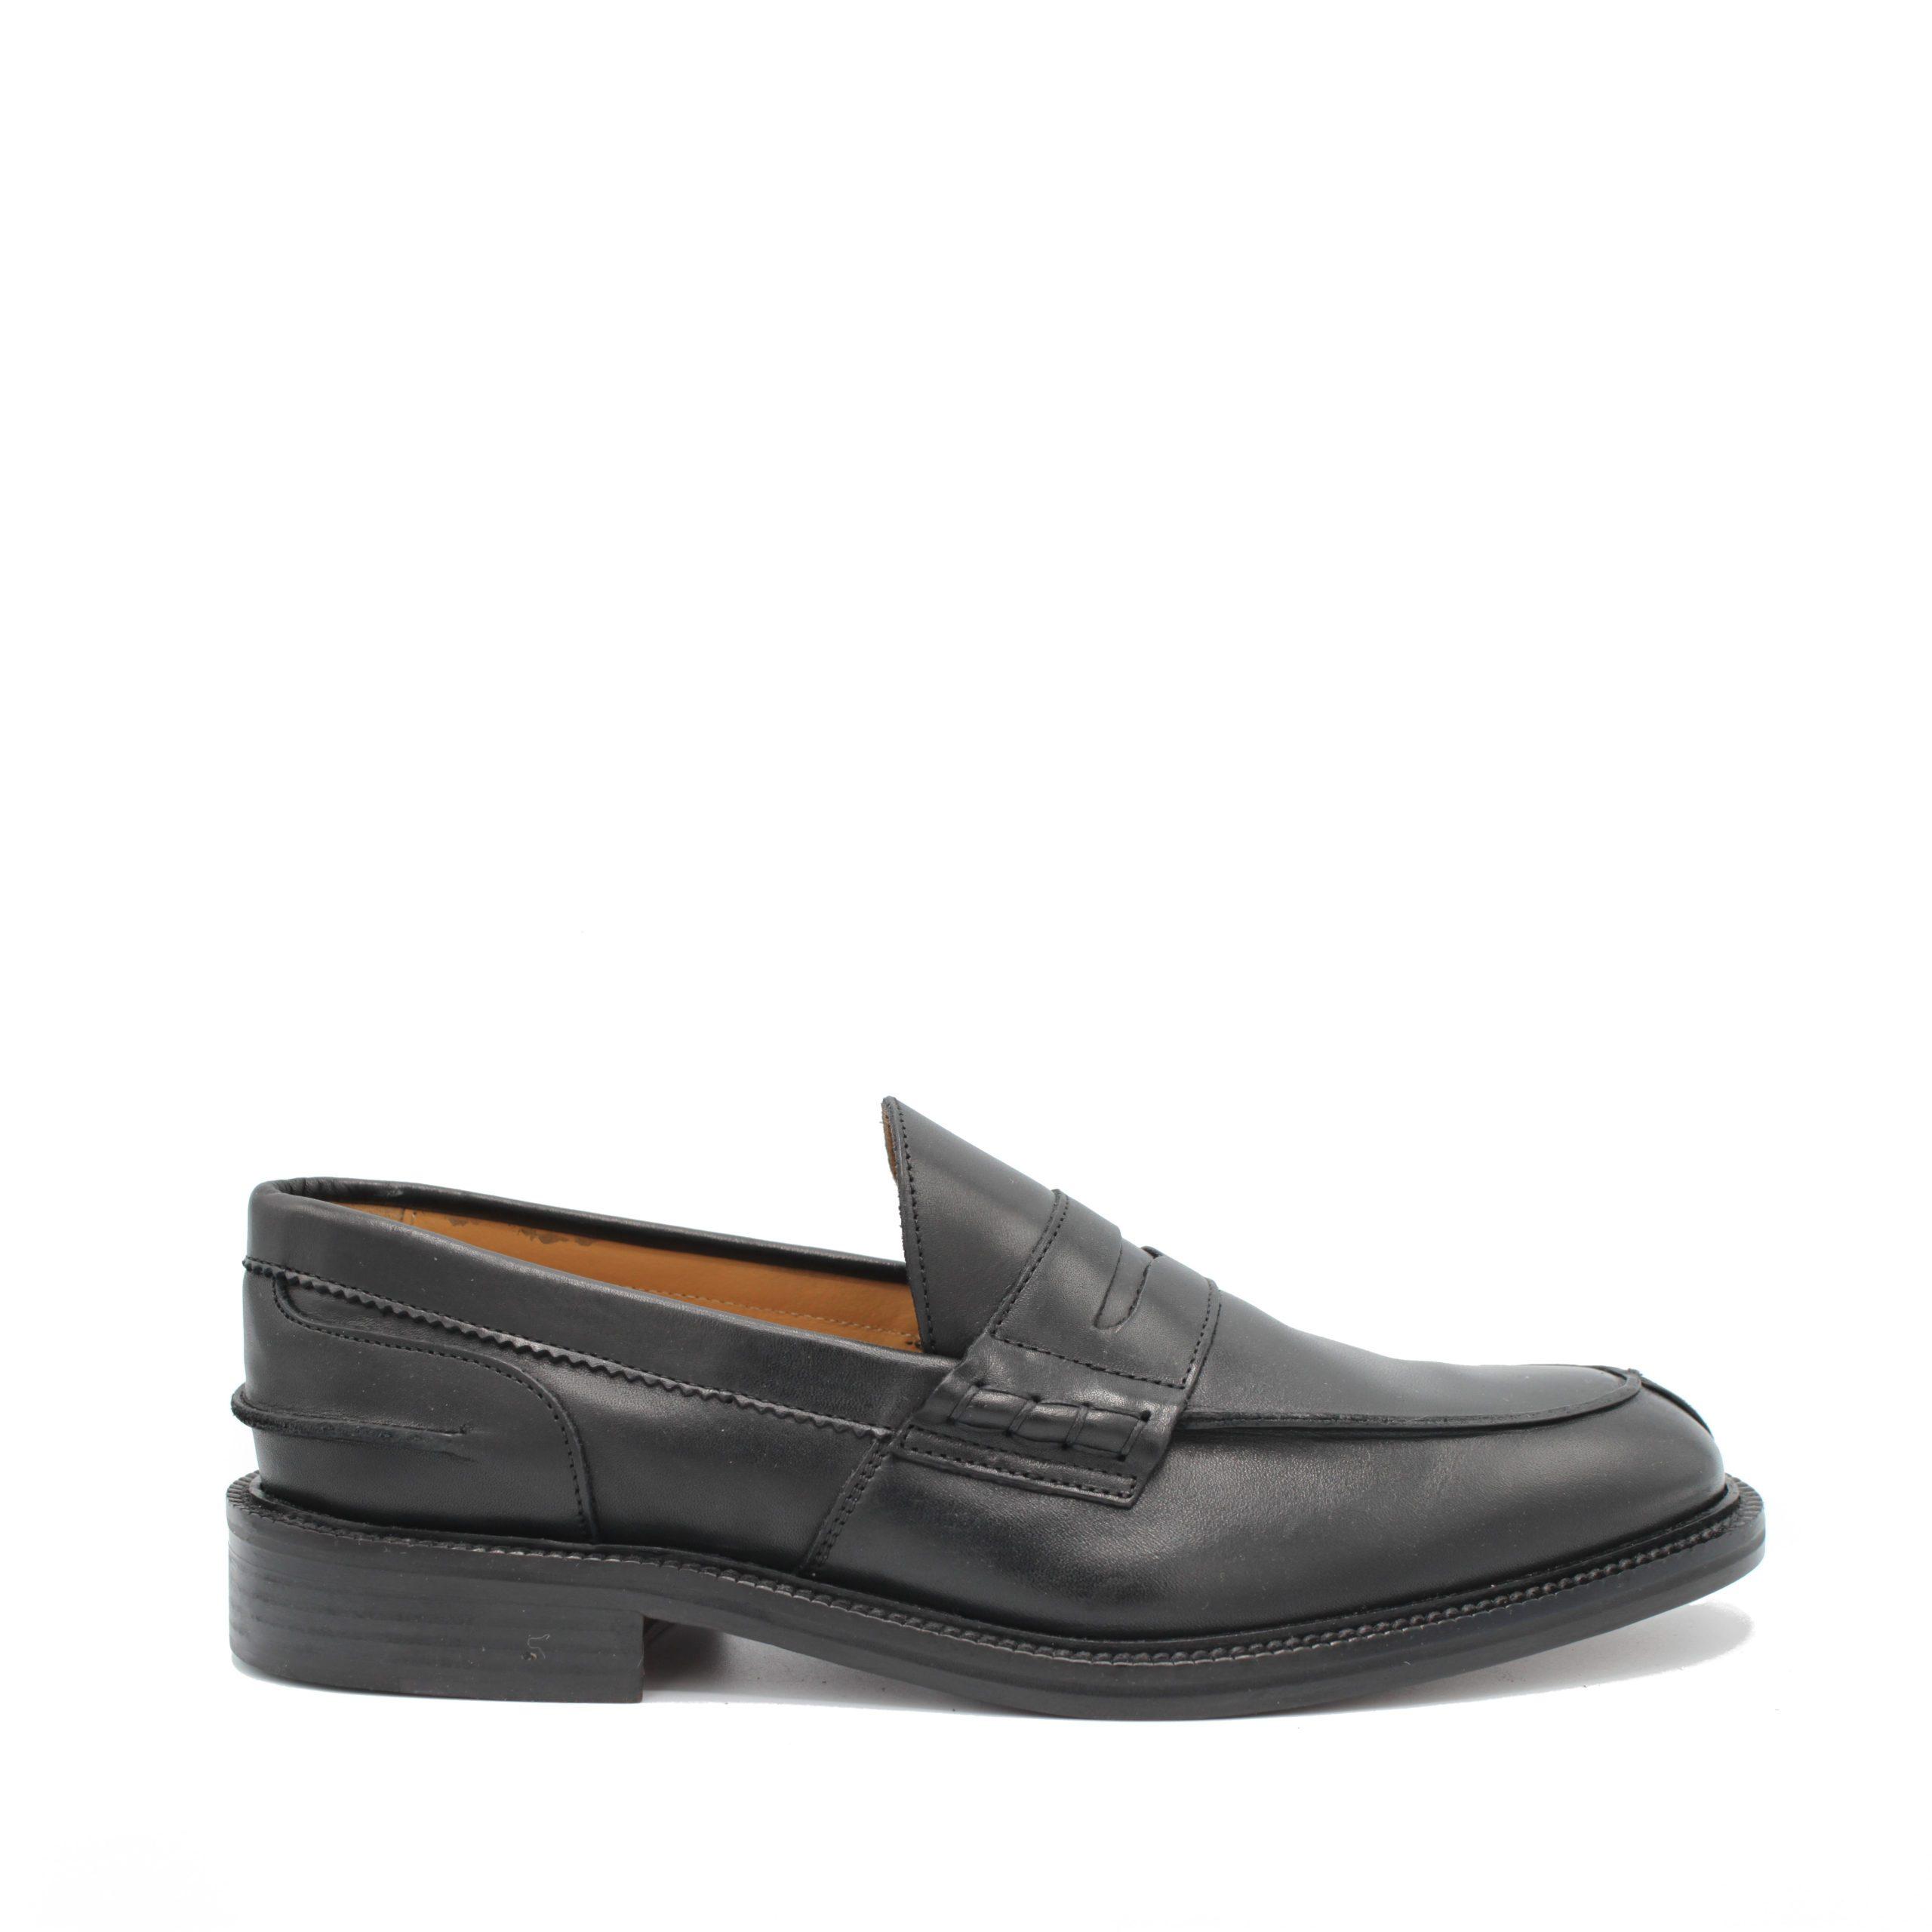 Saxone of Scotland Men's Calf Leather Loafer Black 030_Black - EU40.5/US7.5